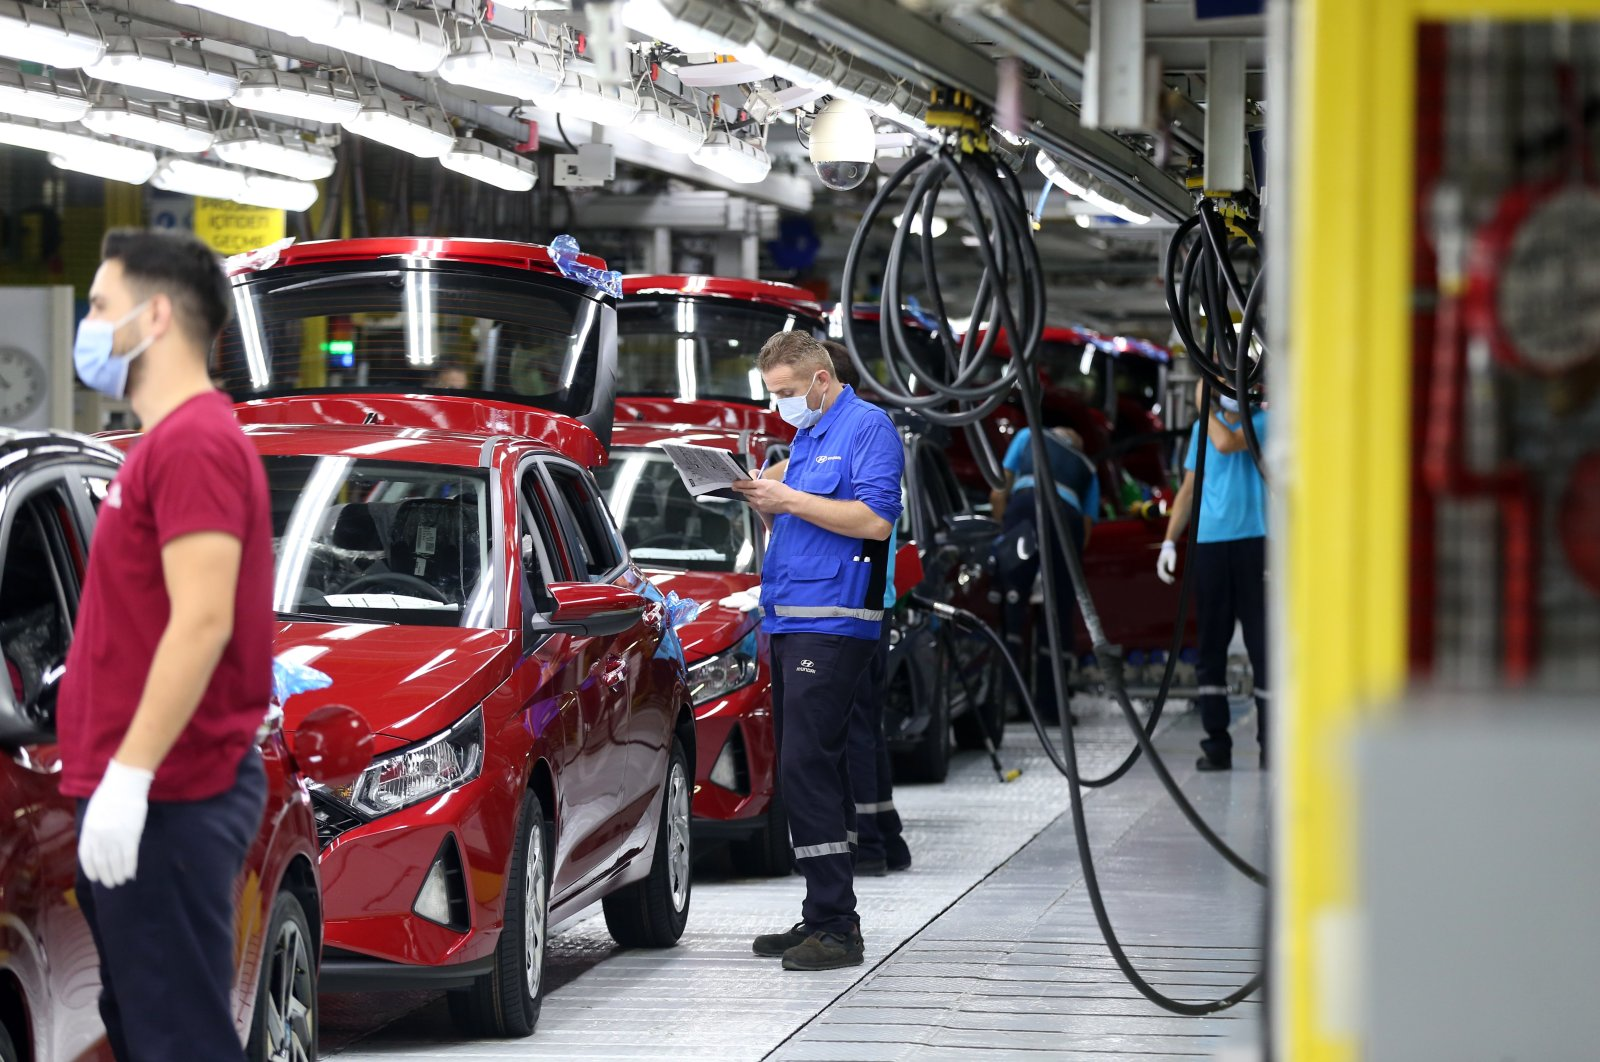 Workers are seen beside new i20 model cars at Hyundai Assan's Izmit factory in northwestern Kocaeli, Turkey, Aug. 28, 2020. (AA Photo)